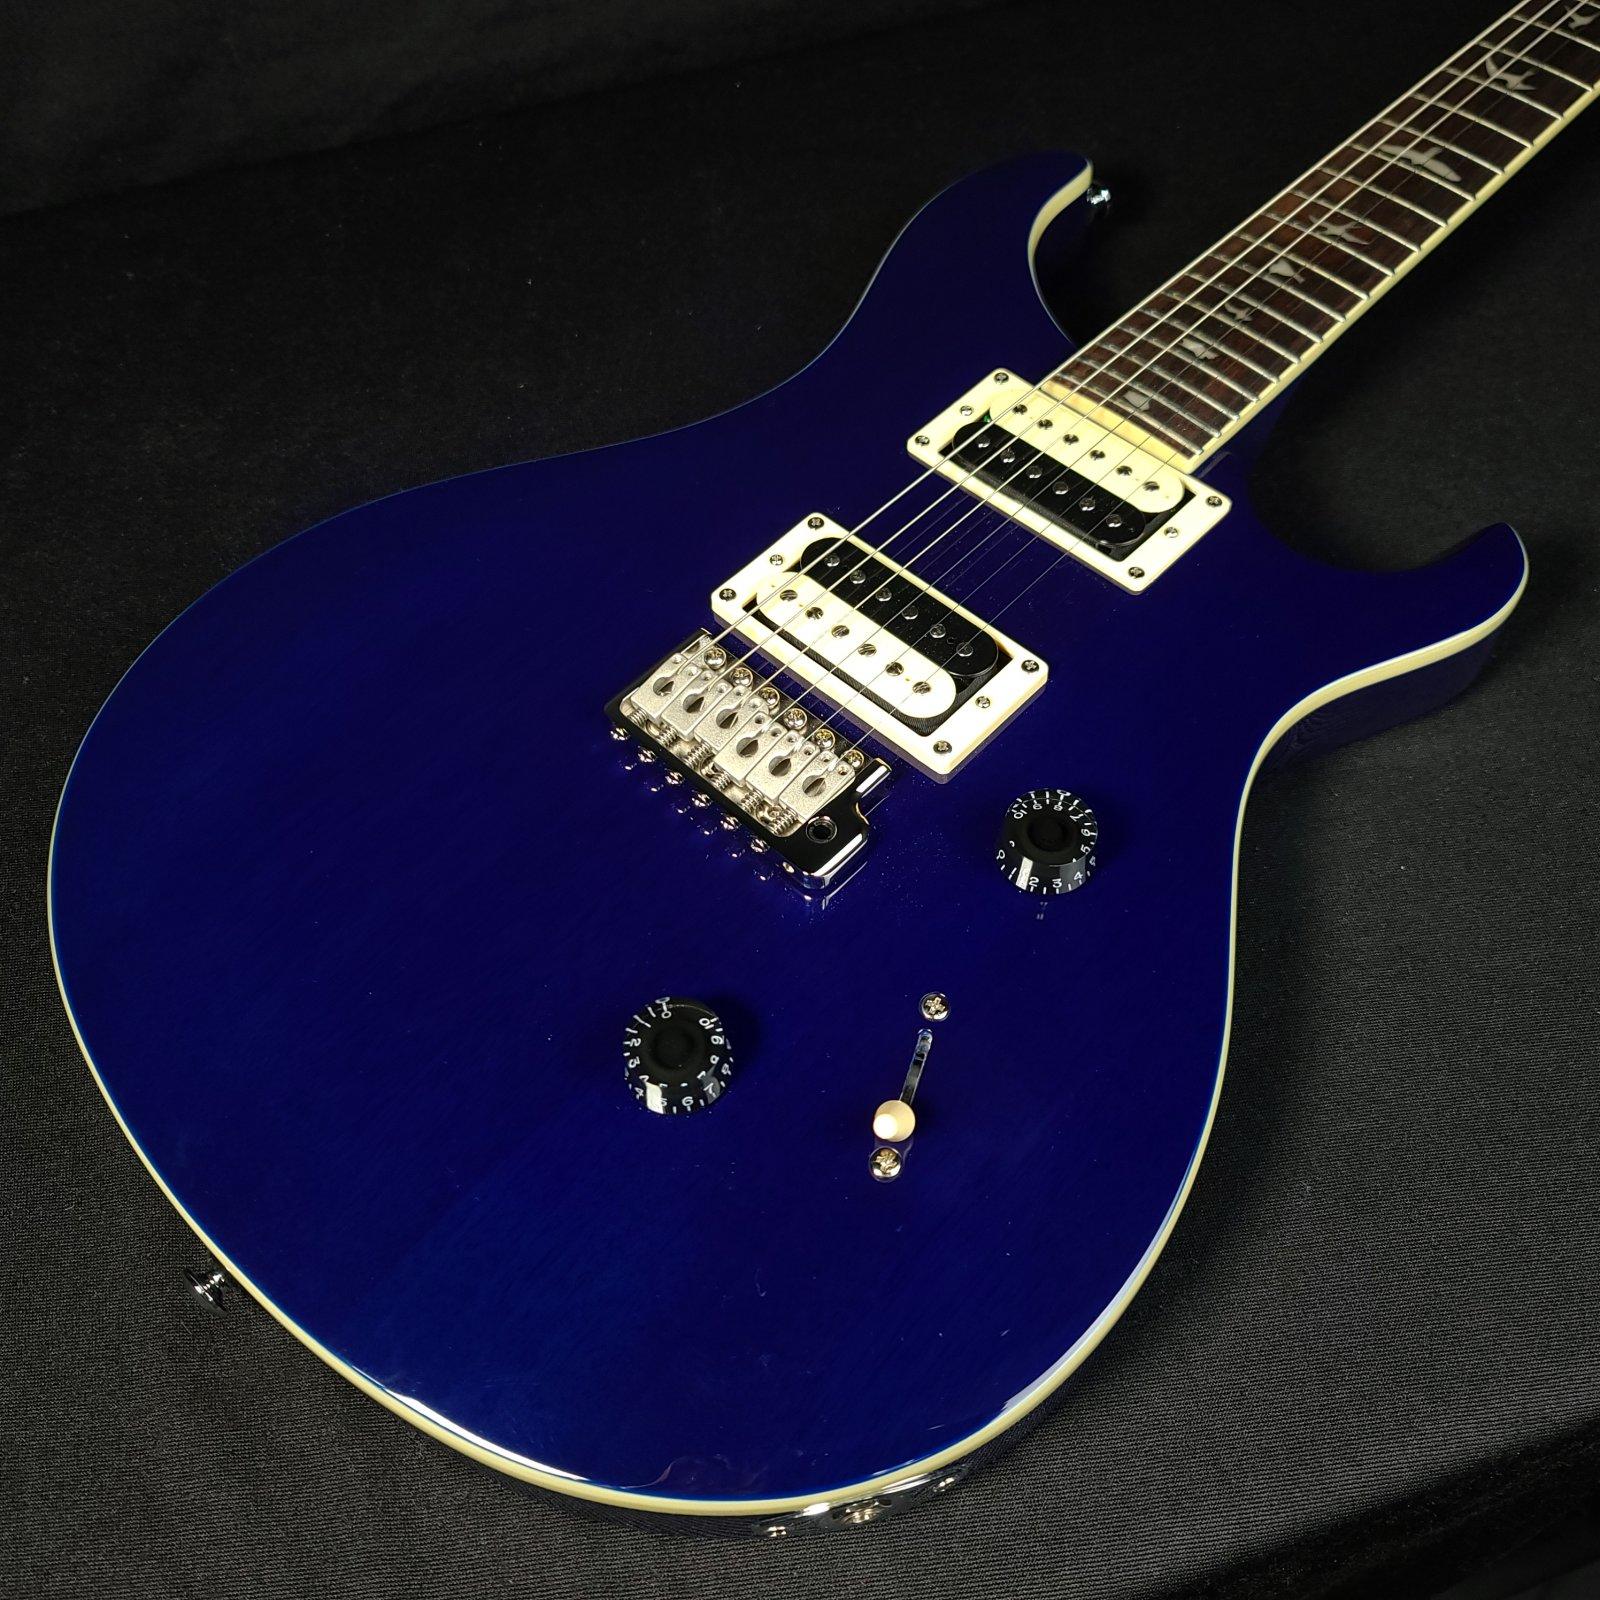 Paul Reed Smith PRS SE Standard 24 Translucent Blue